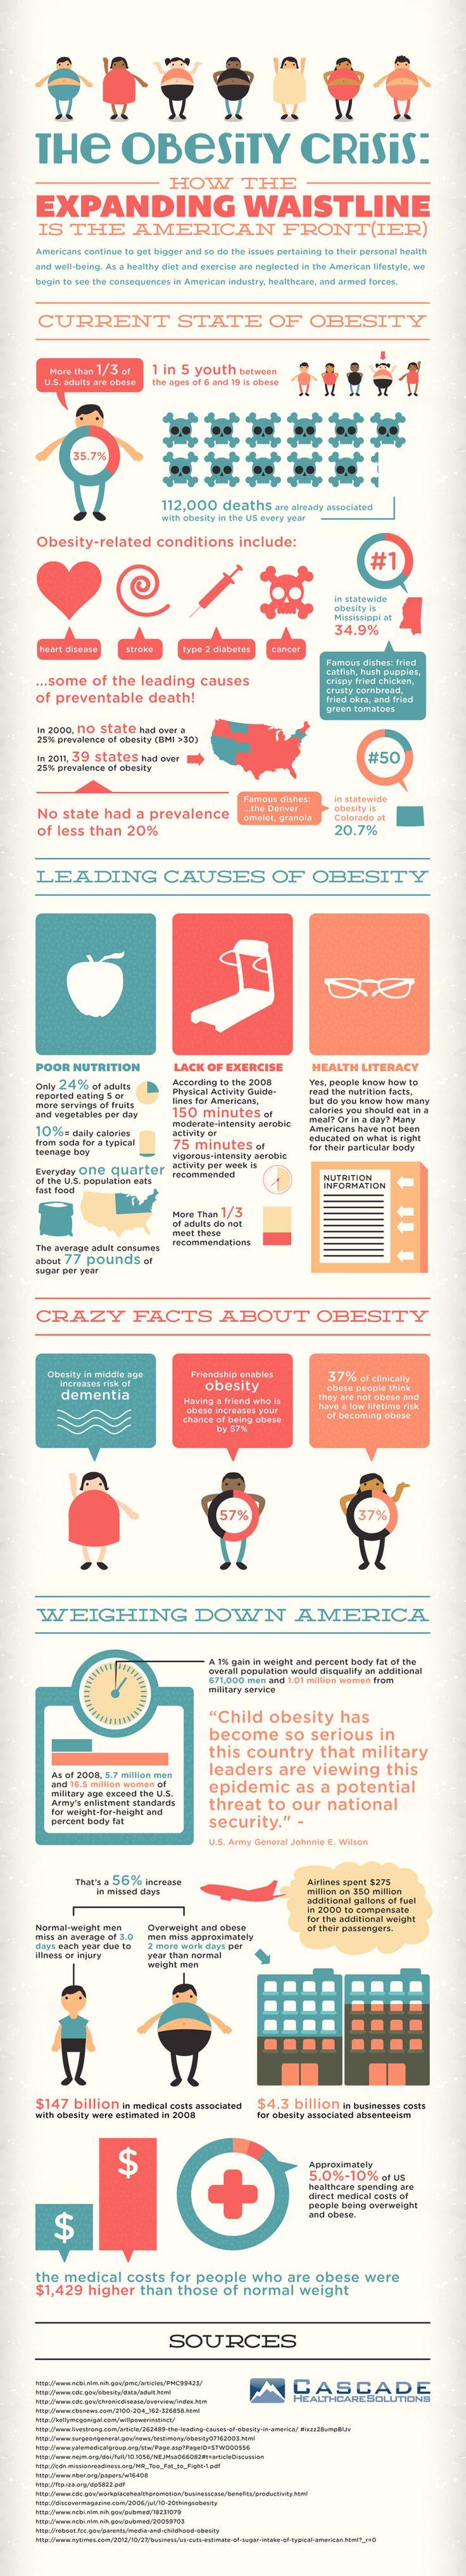 Obesity Crisis Infographic